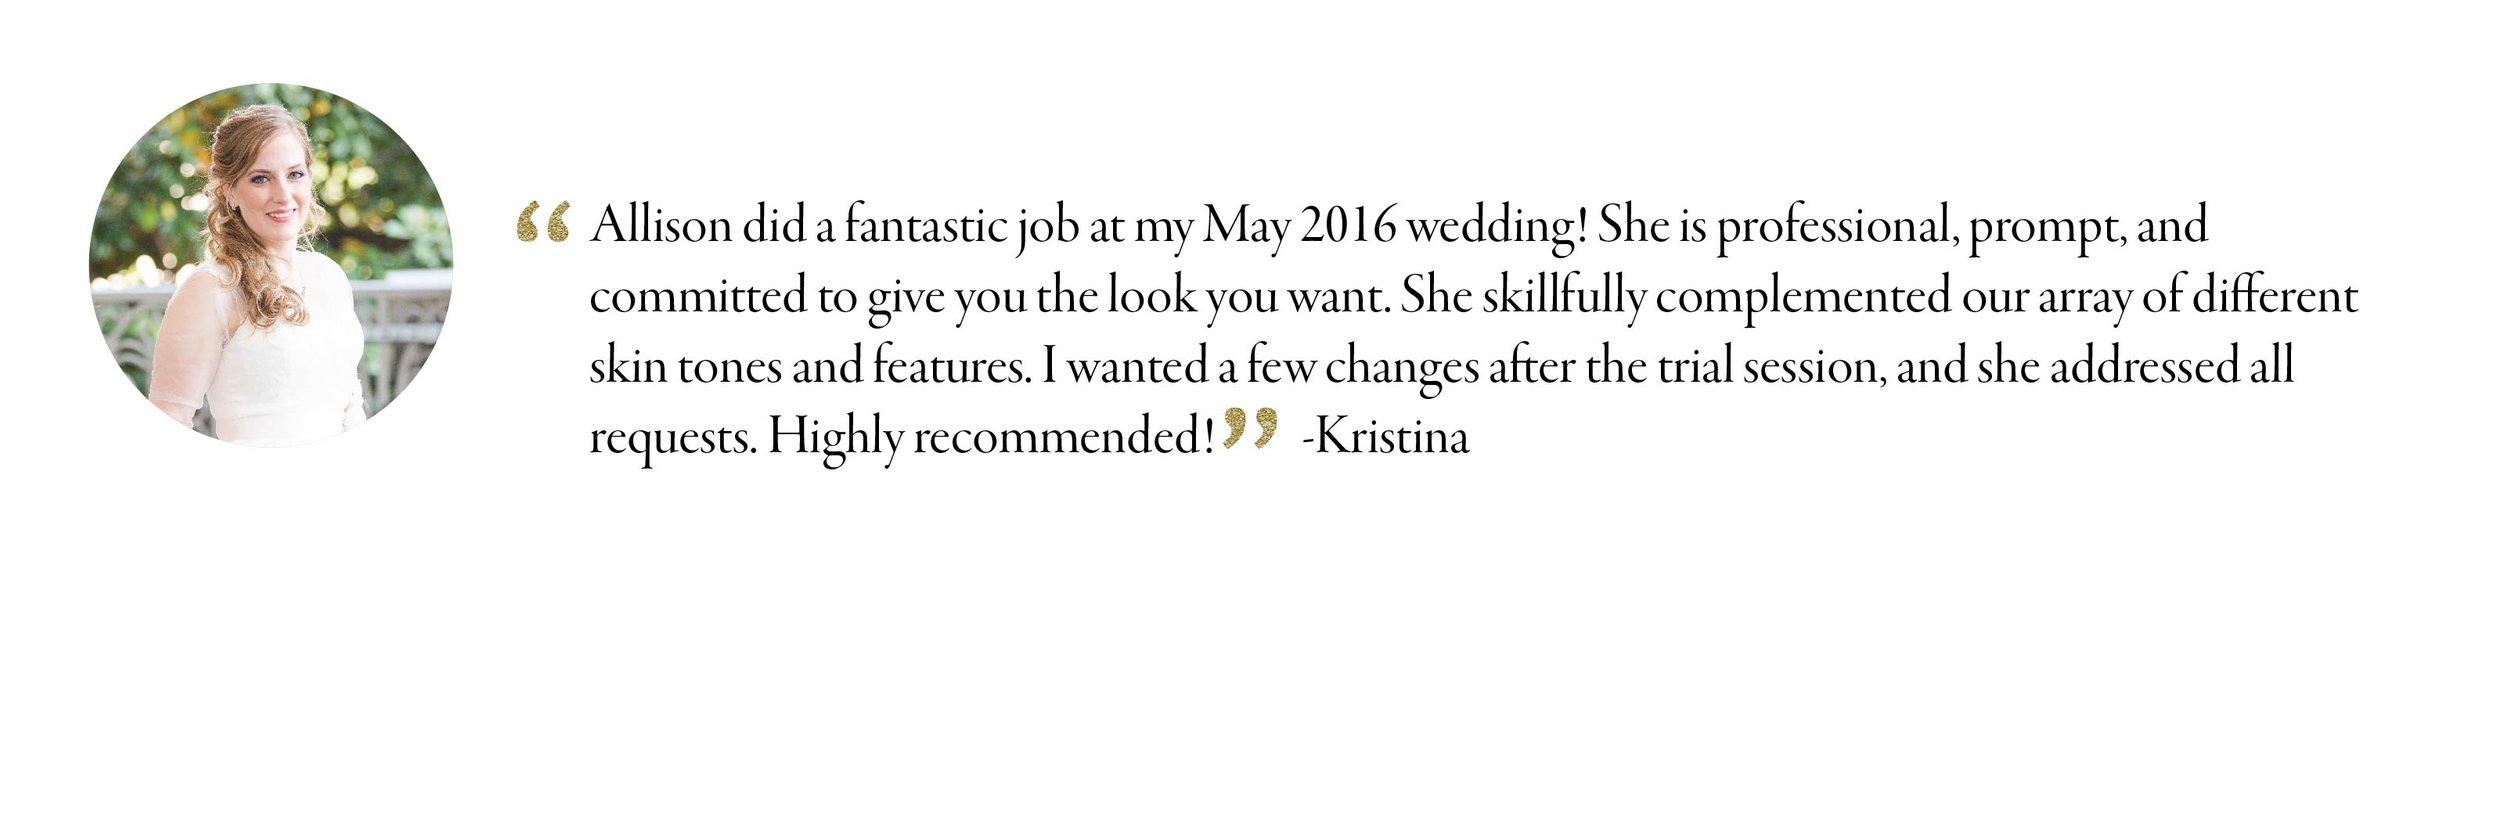 Wedding Wire Testimonial from Kristina-01.jpg